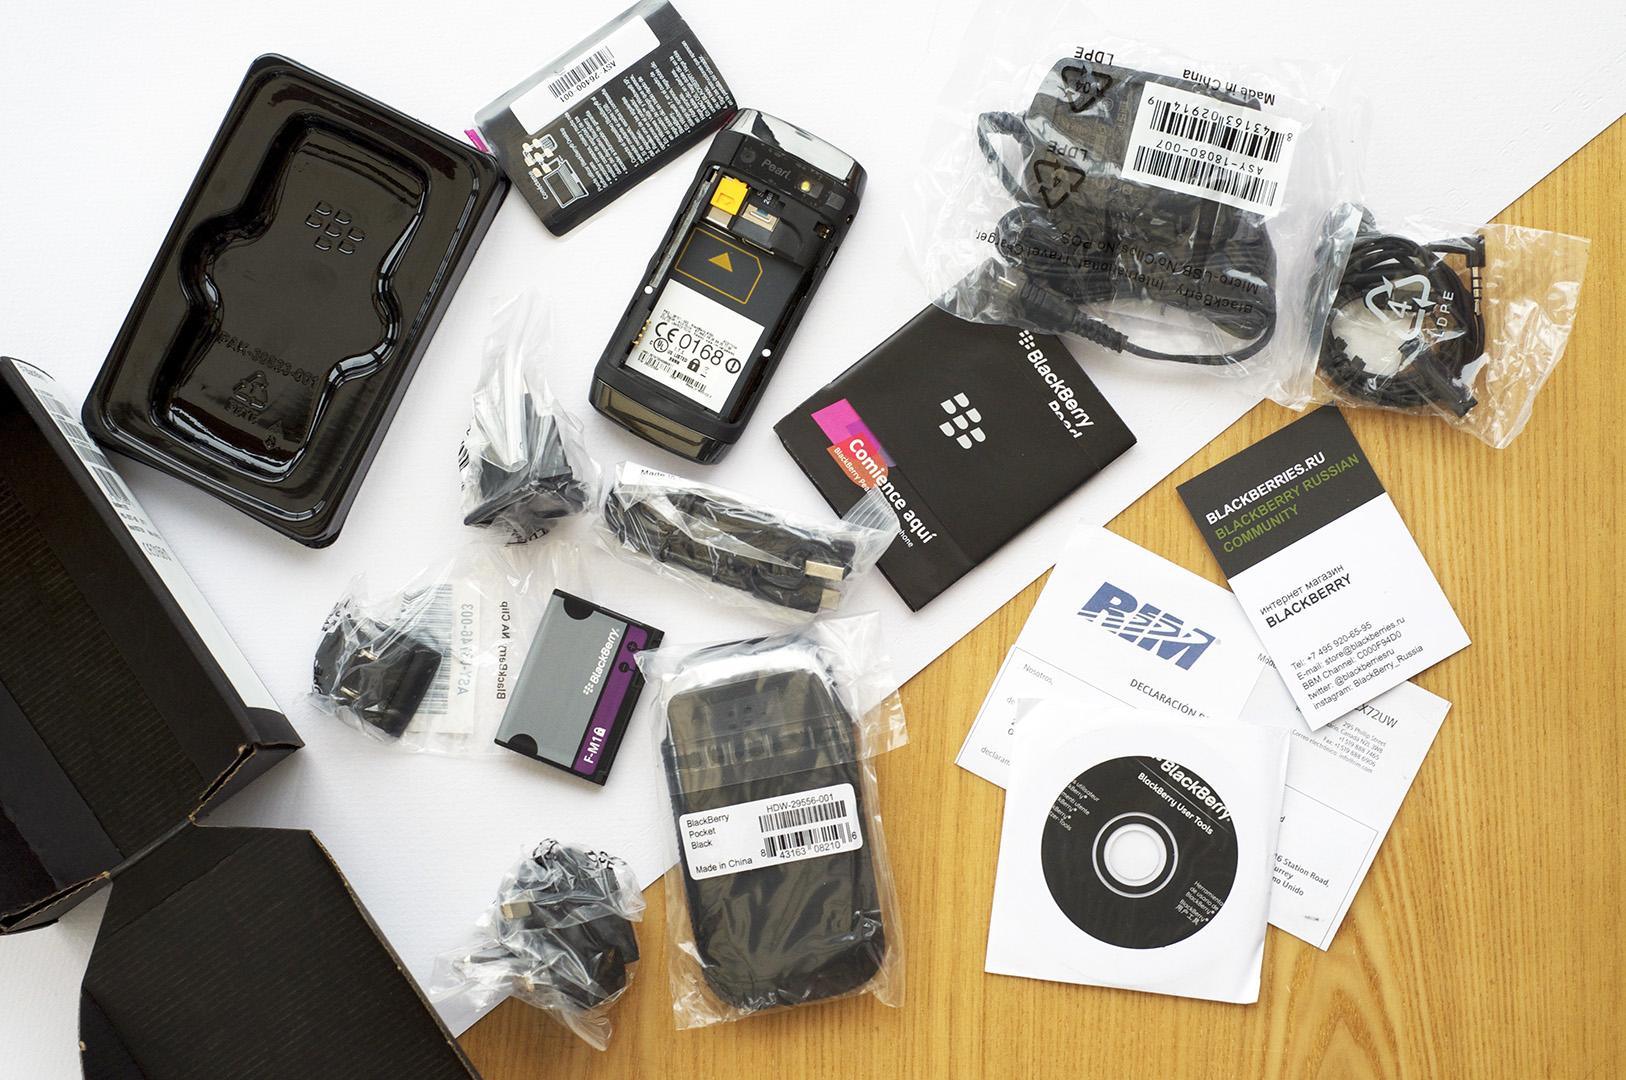 blackberry-9100-pearl-3g-04